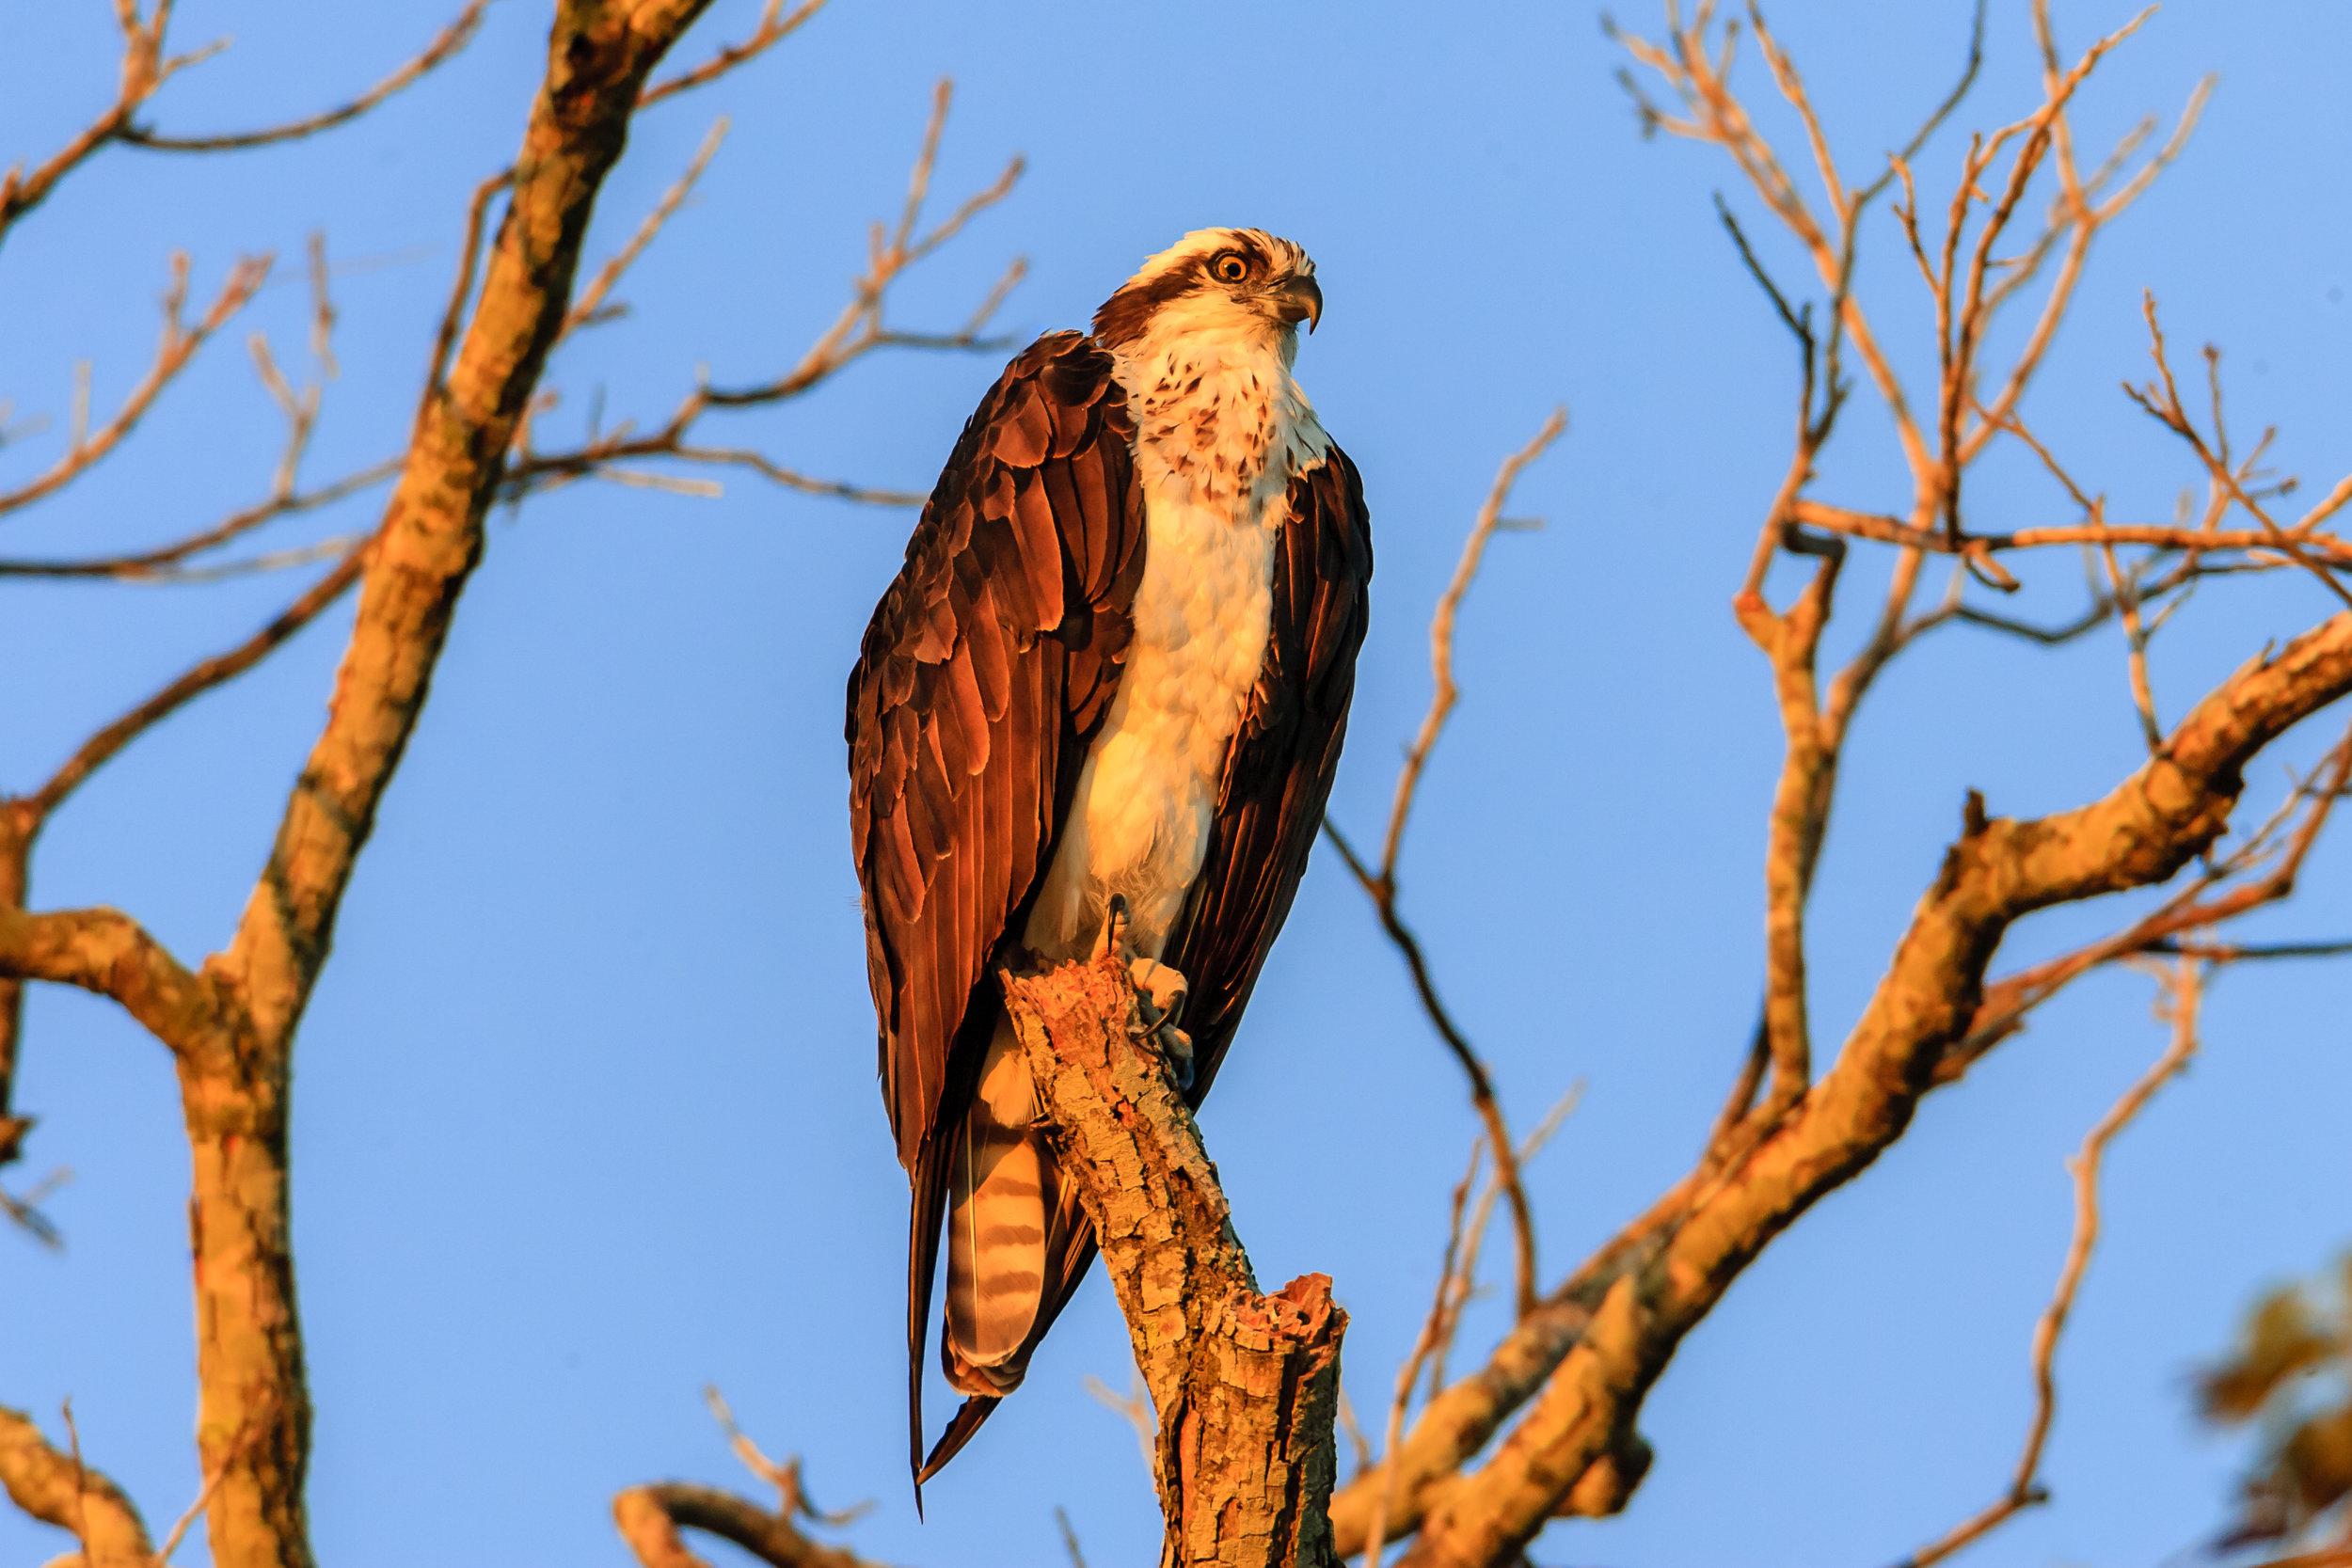 Species: Osprey Photo Credit: Damian Martinez Date: October 2016 Location: Acequia Park